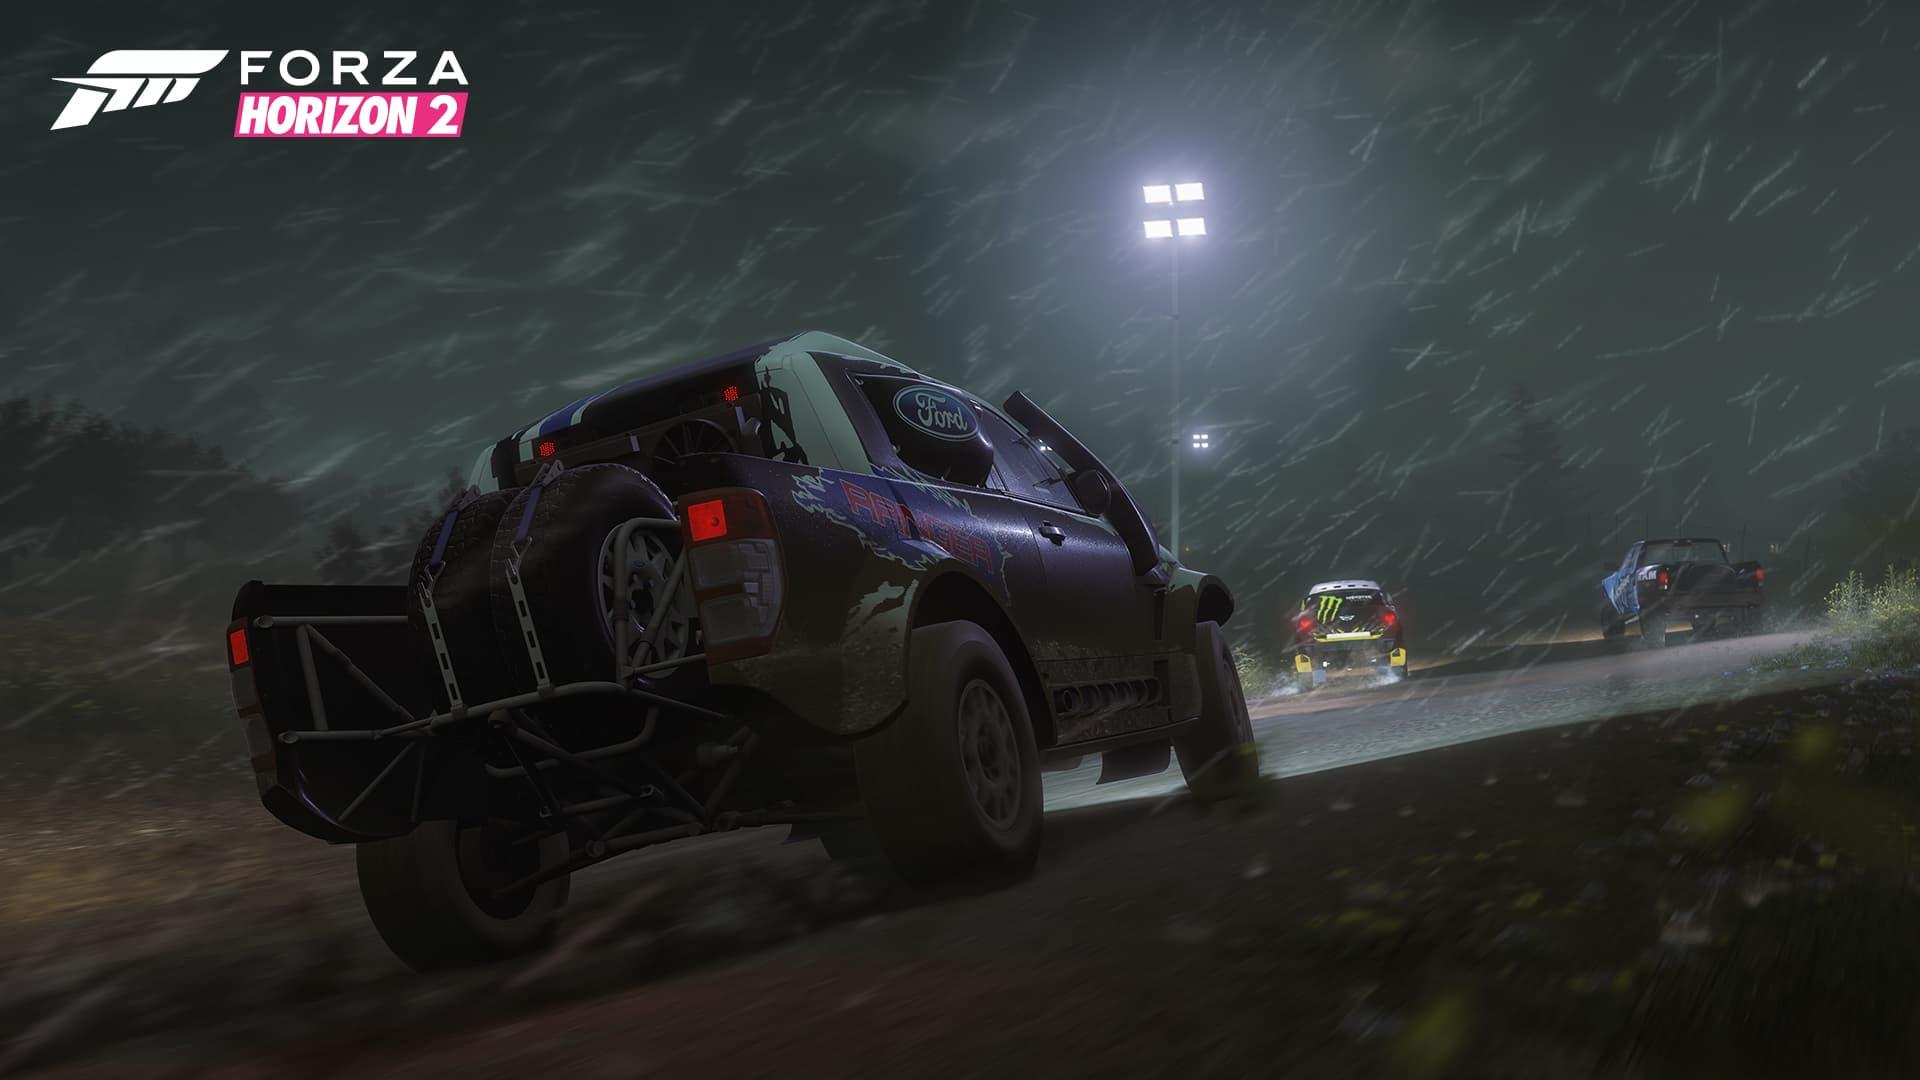 Xbox One Forza Horizon 2: Storm Island